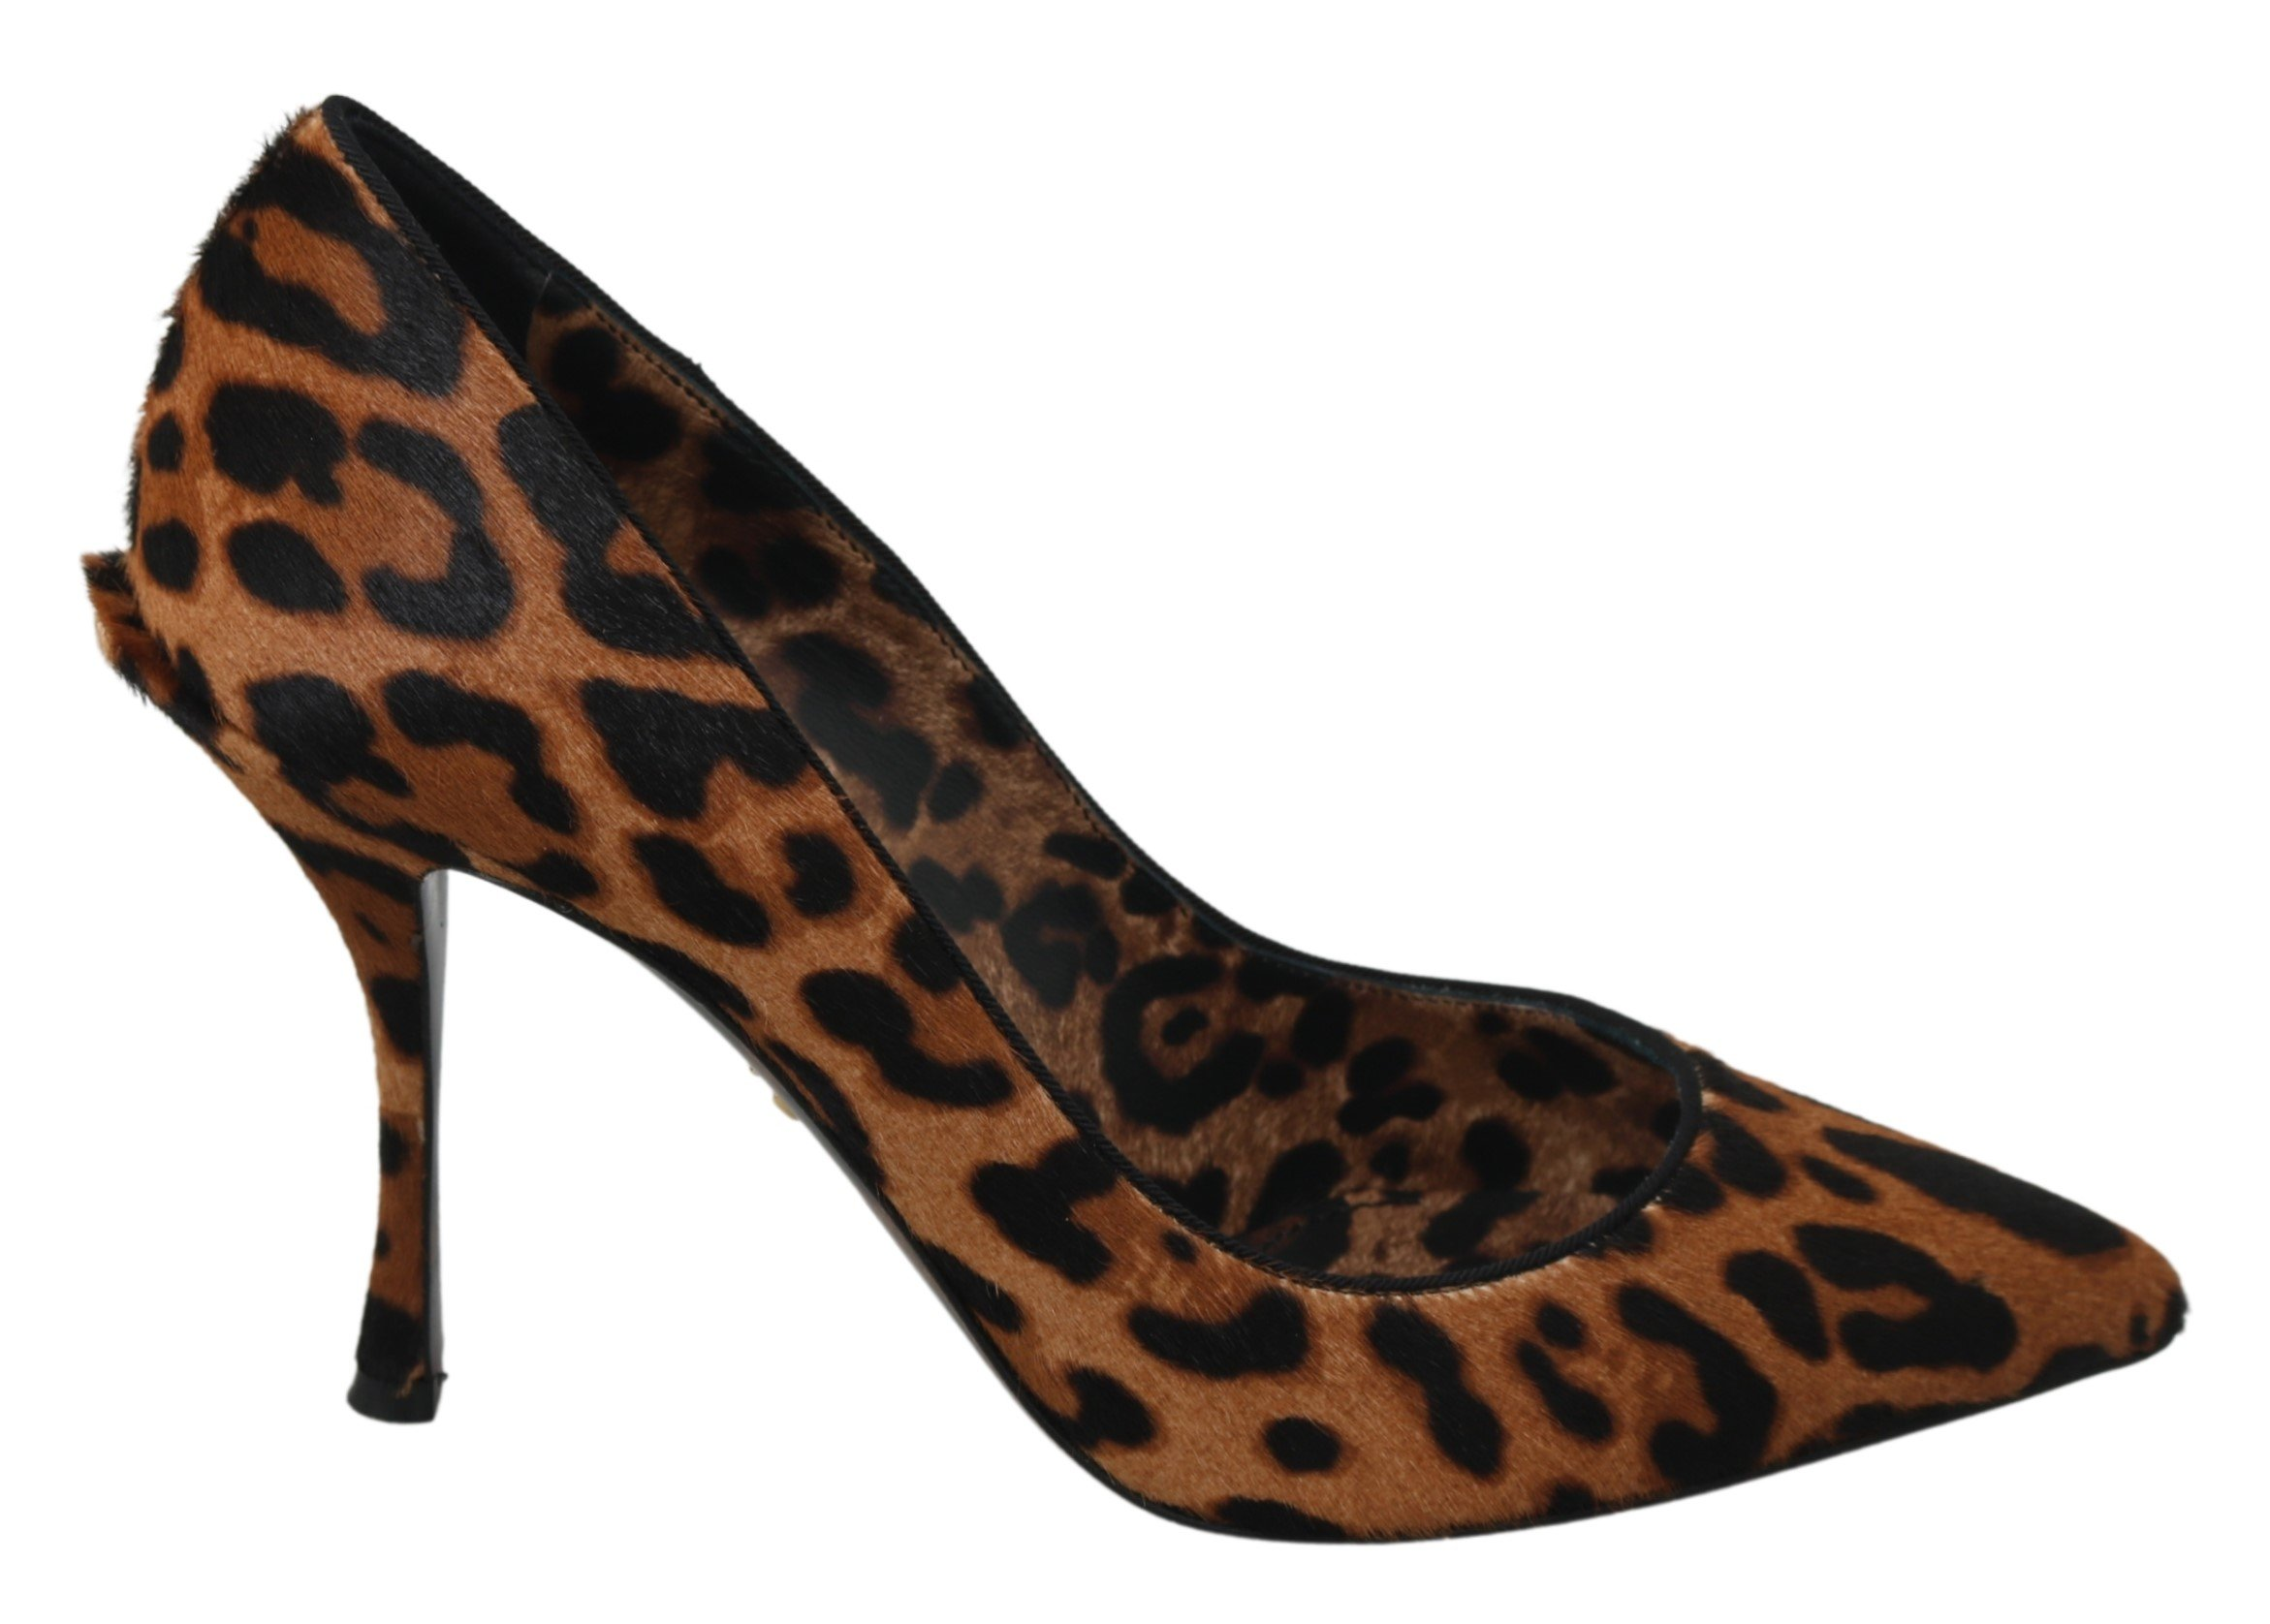 Dolce & Gabbana Women's Leopard Leather Pony Hair Pumps Brown LA6968 - EU39/US8.5